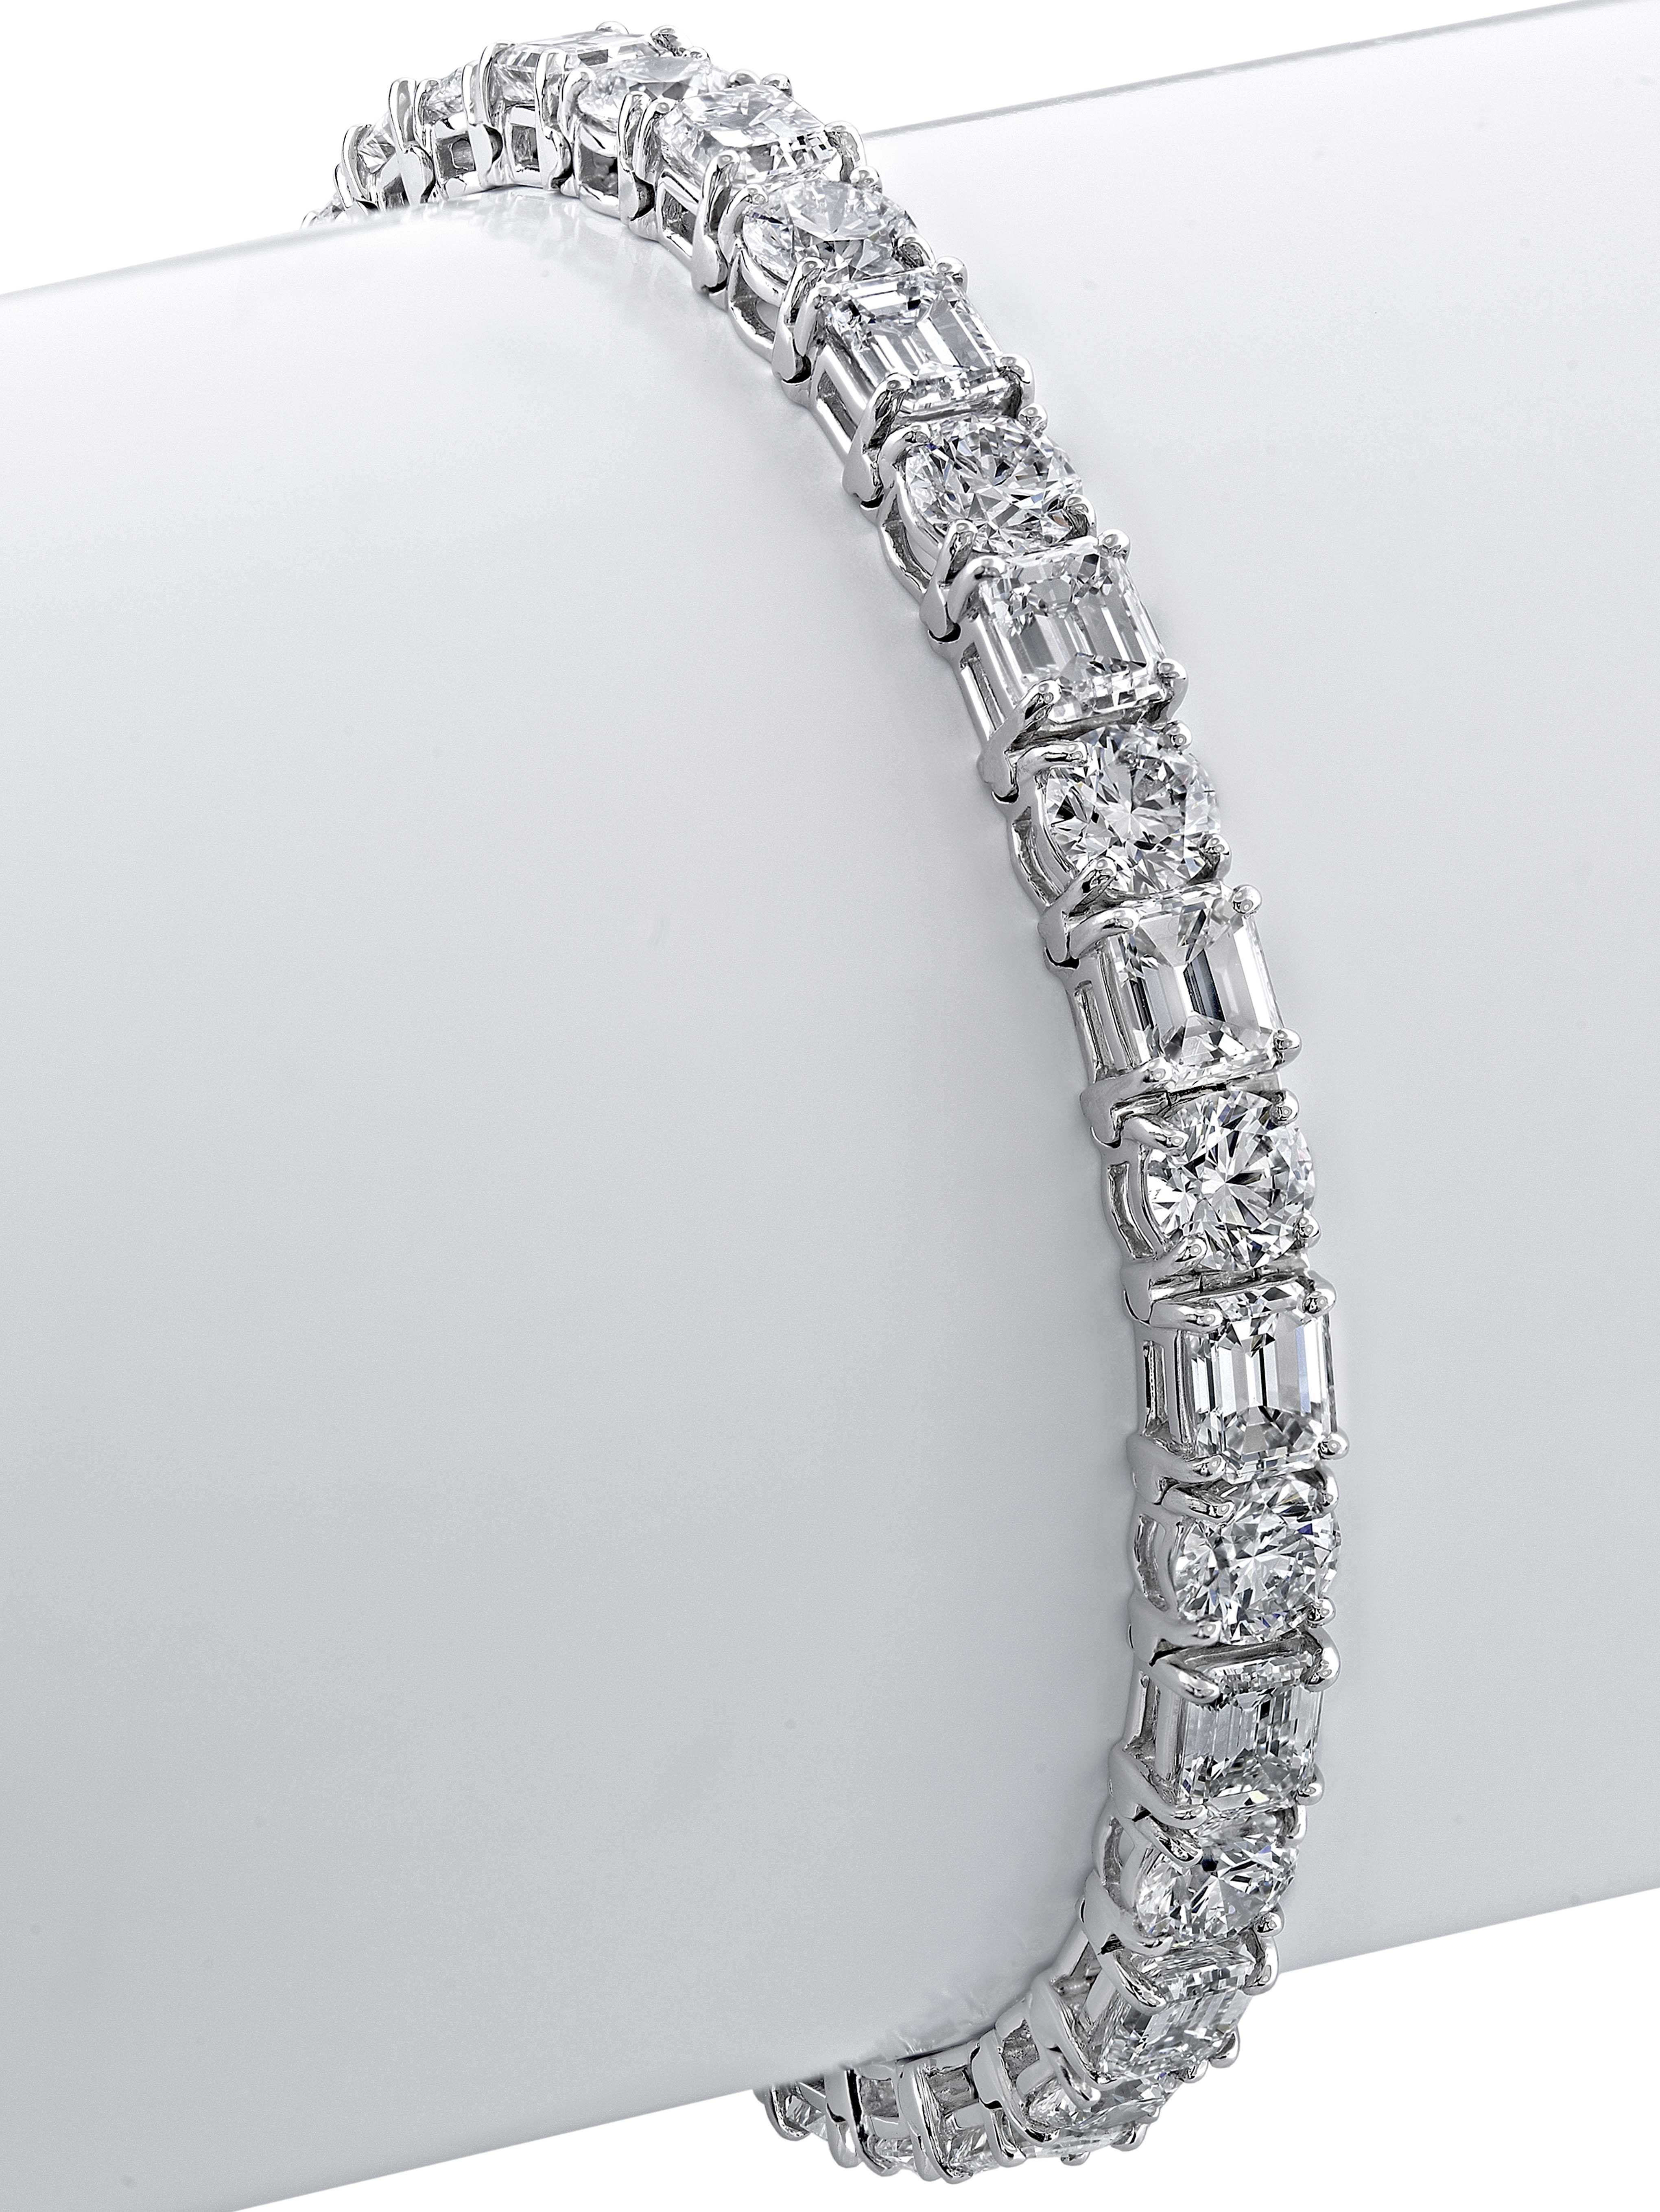 Gordon James Fine Diamonds Tomorrow S Heirlooms Today Exquisite Diamonds Rare Gemstones Rare Diamonds